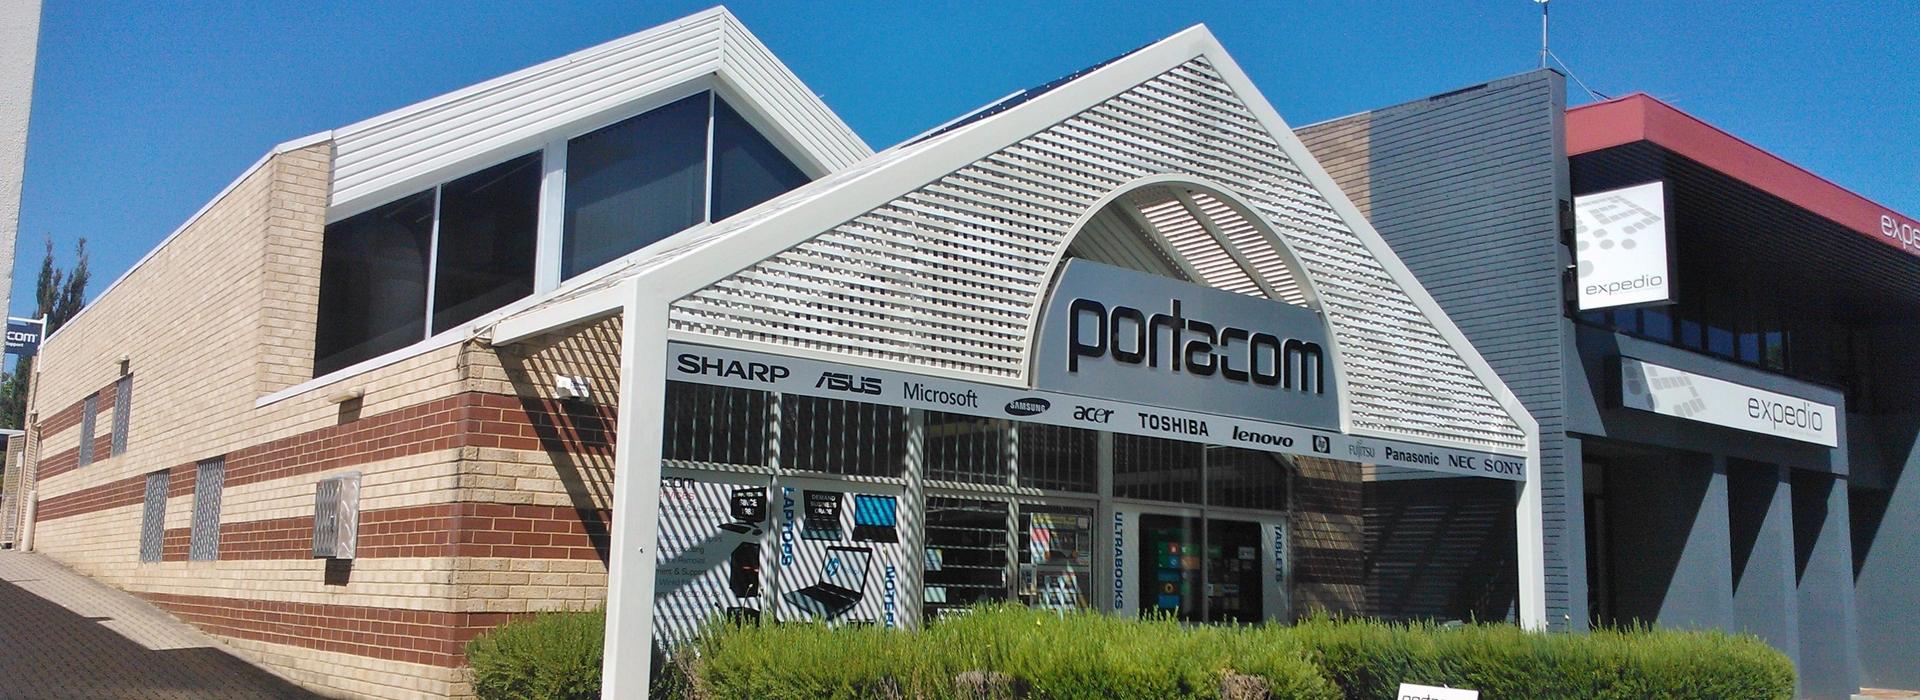 Portacom